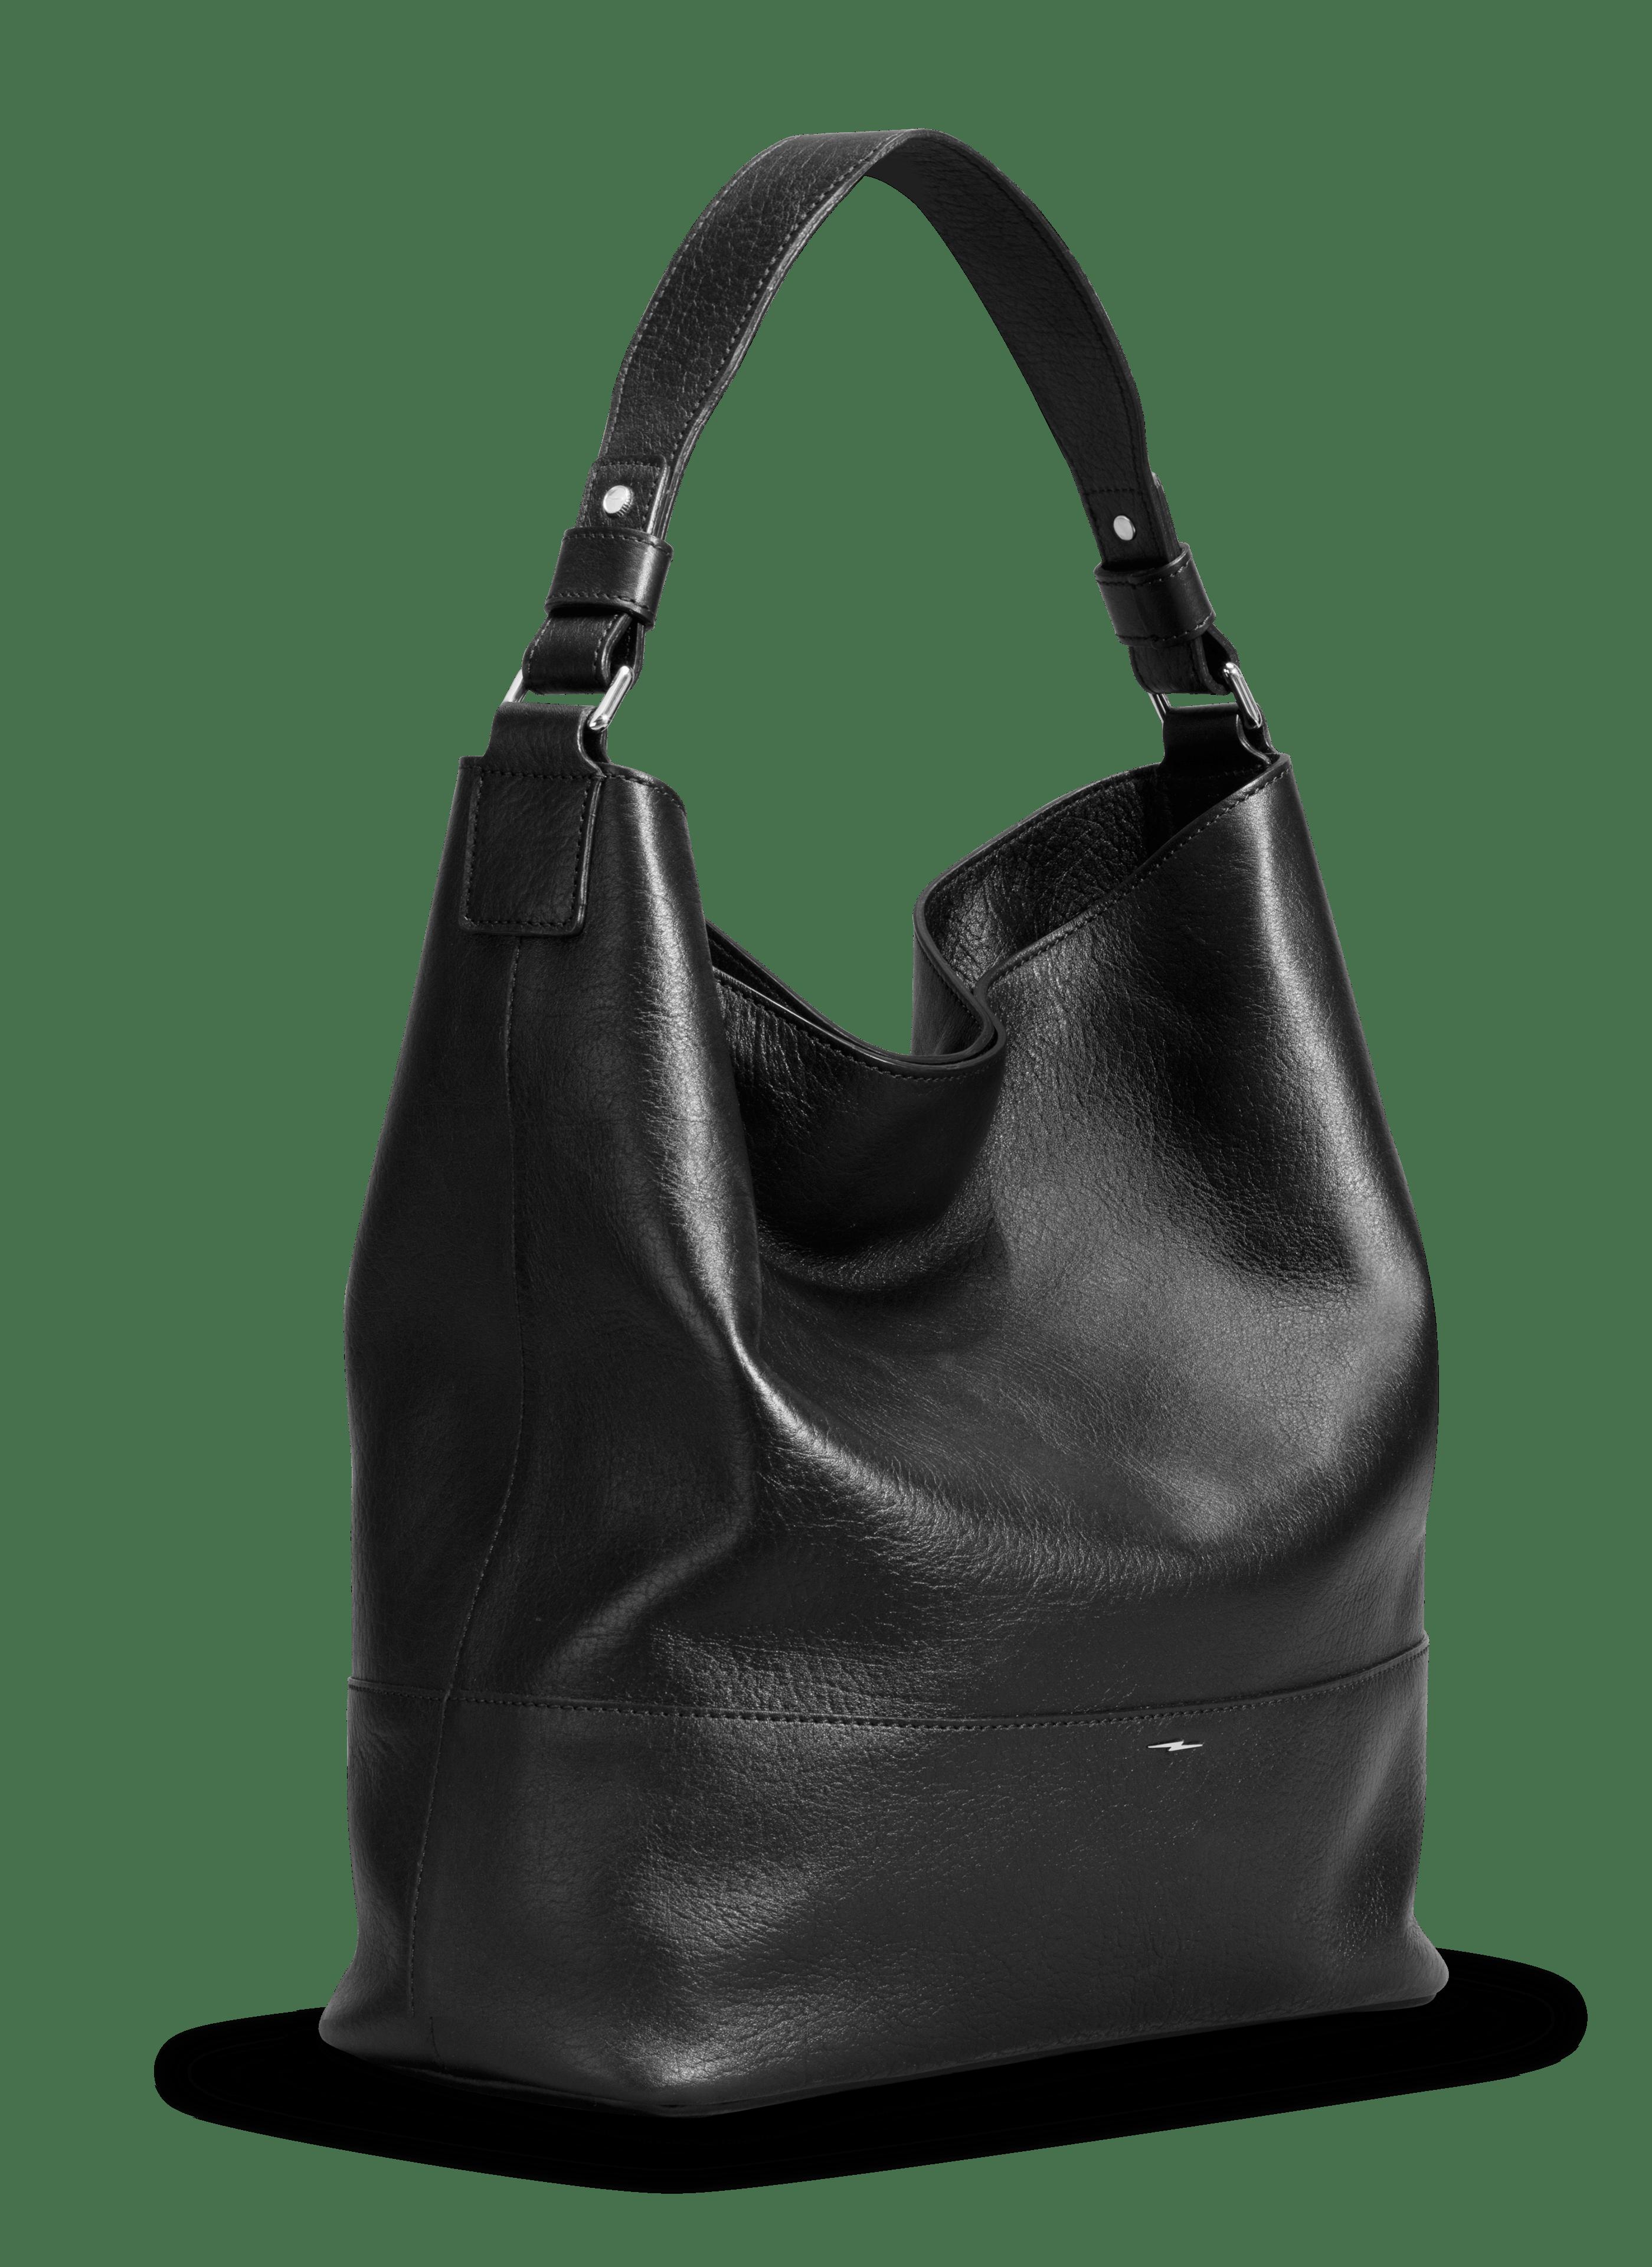 Women's Leather Bag - Relaxed Hobo | Shinola® Detroit